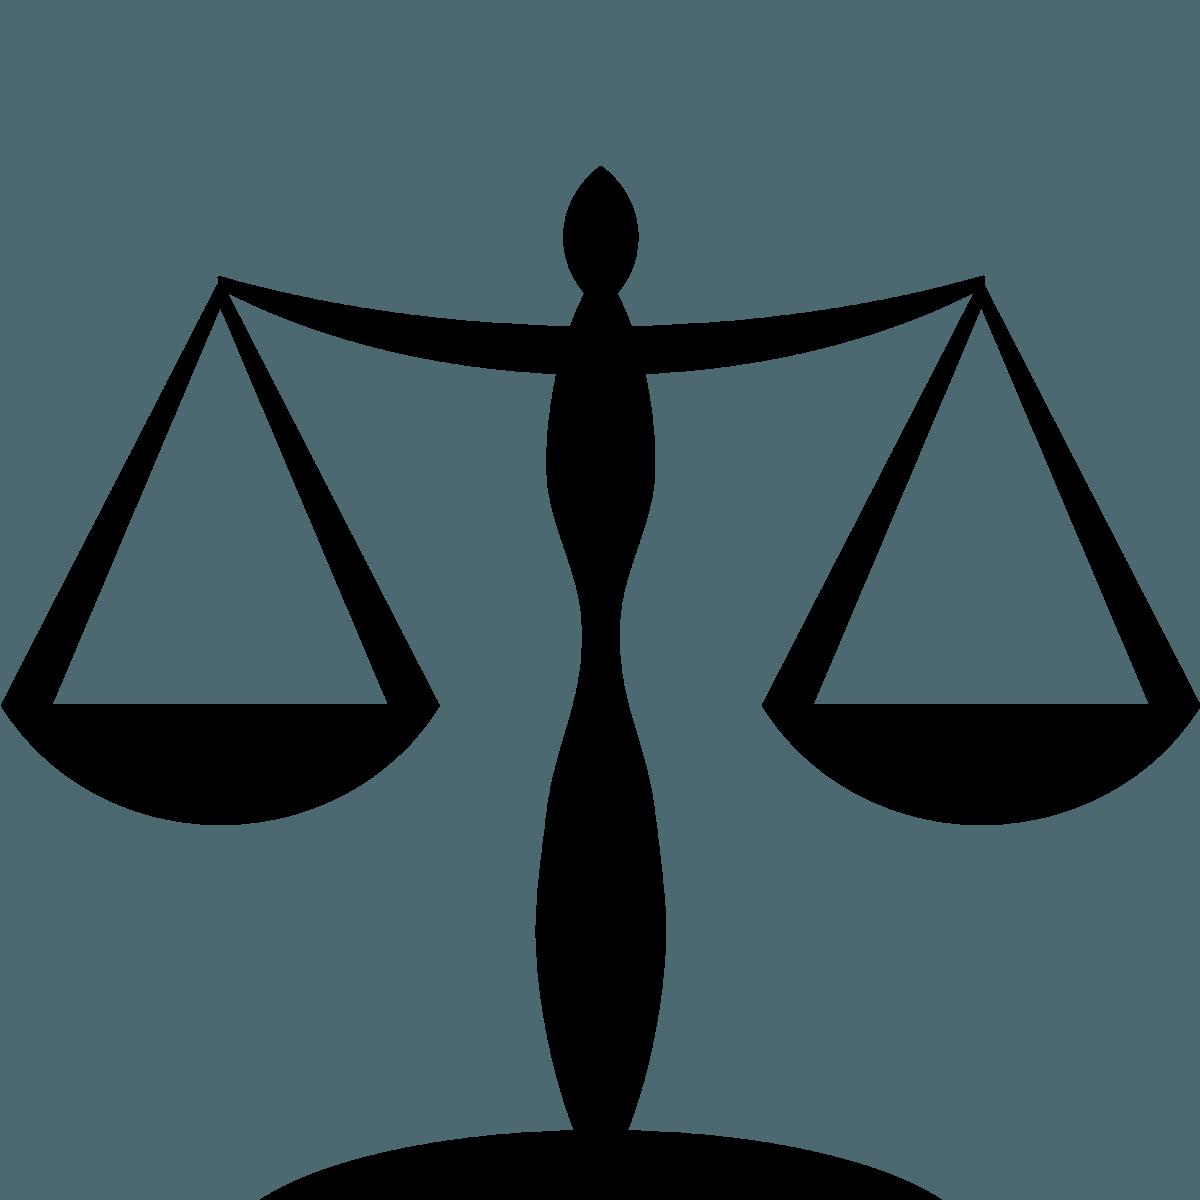 Balance Clipart Transparent Background Balance